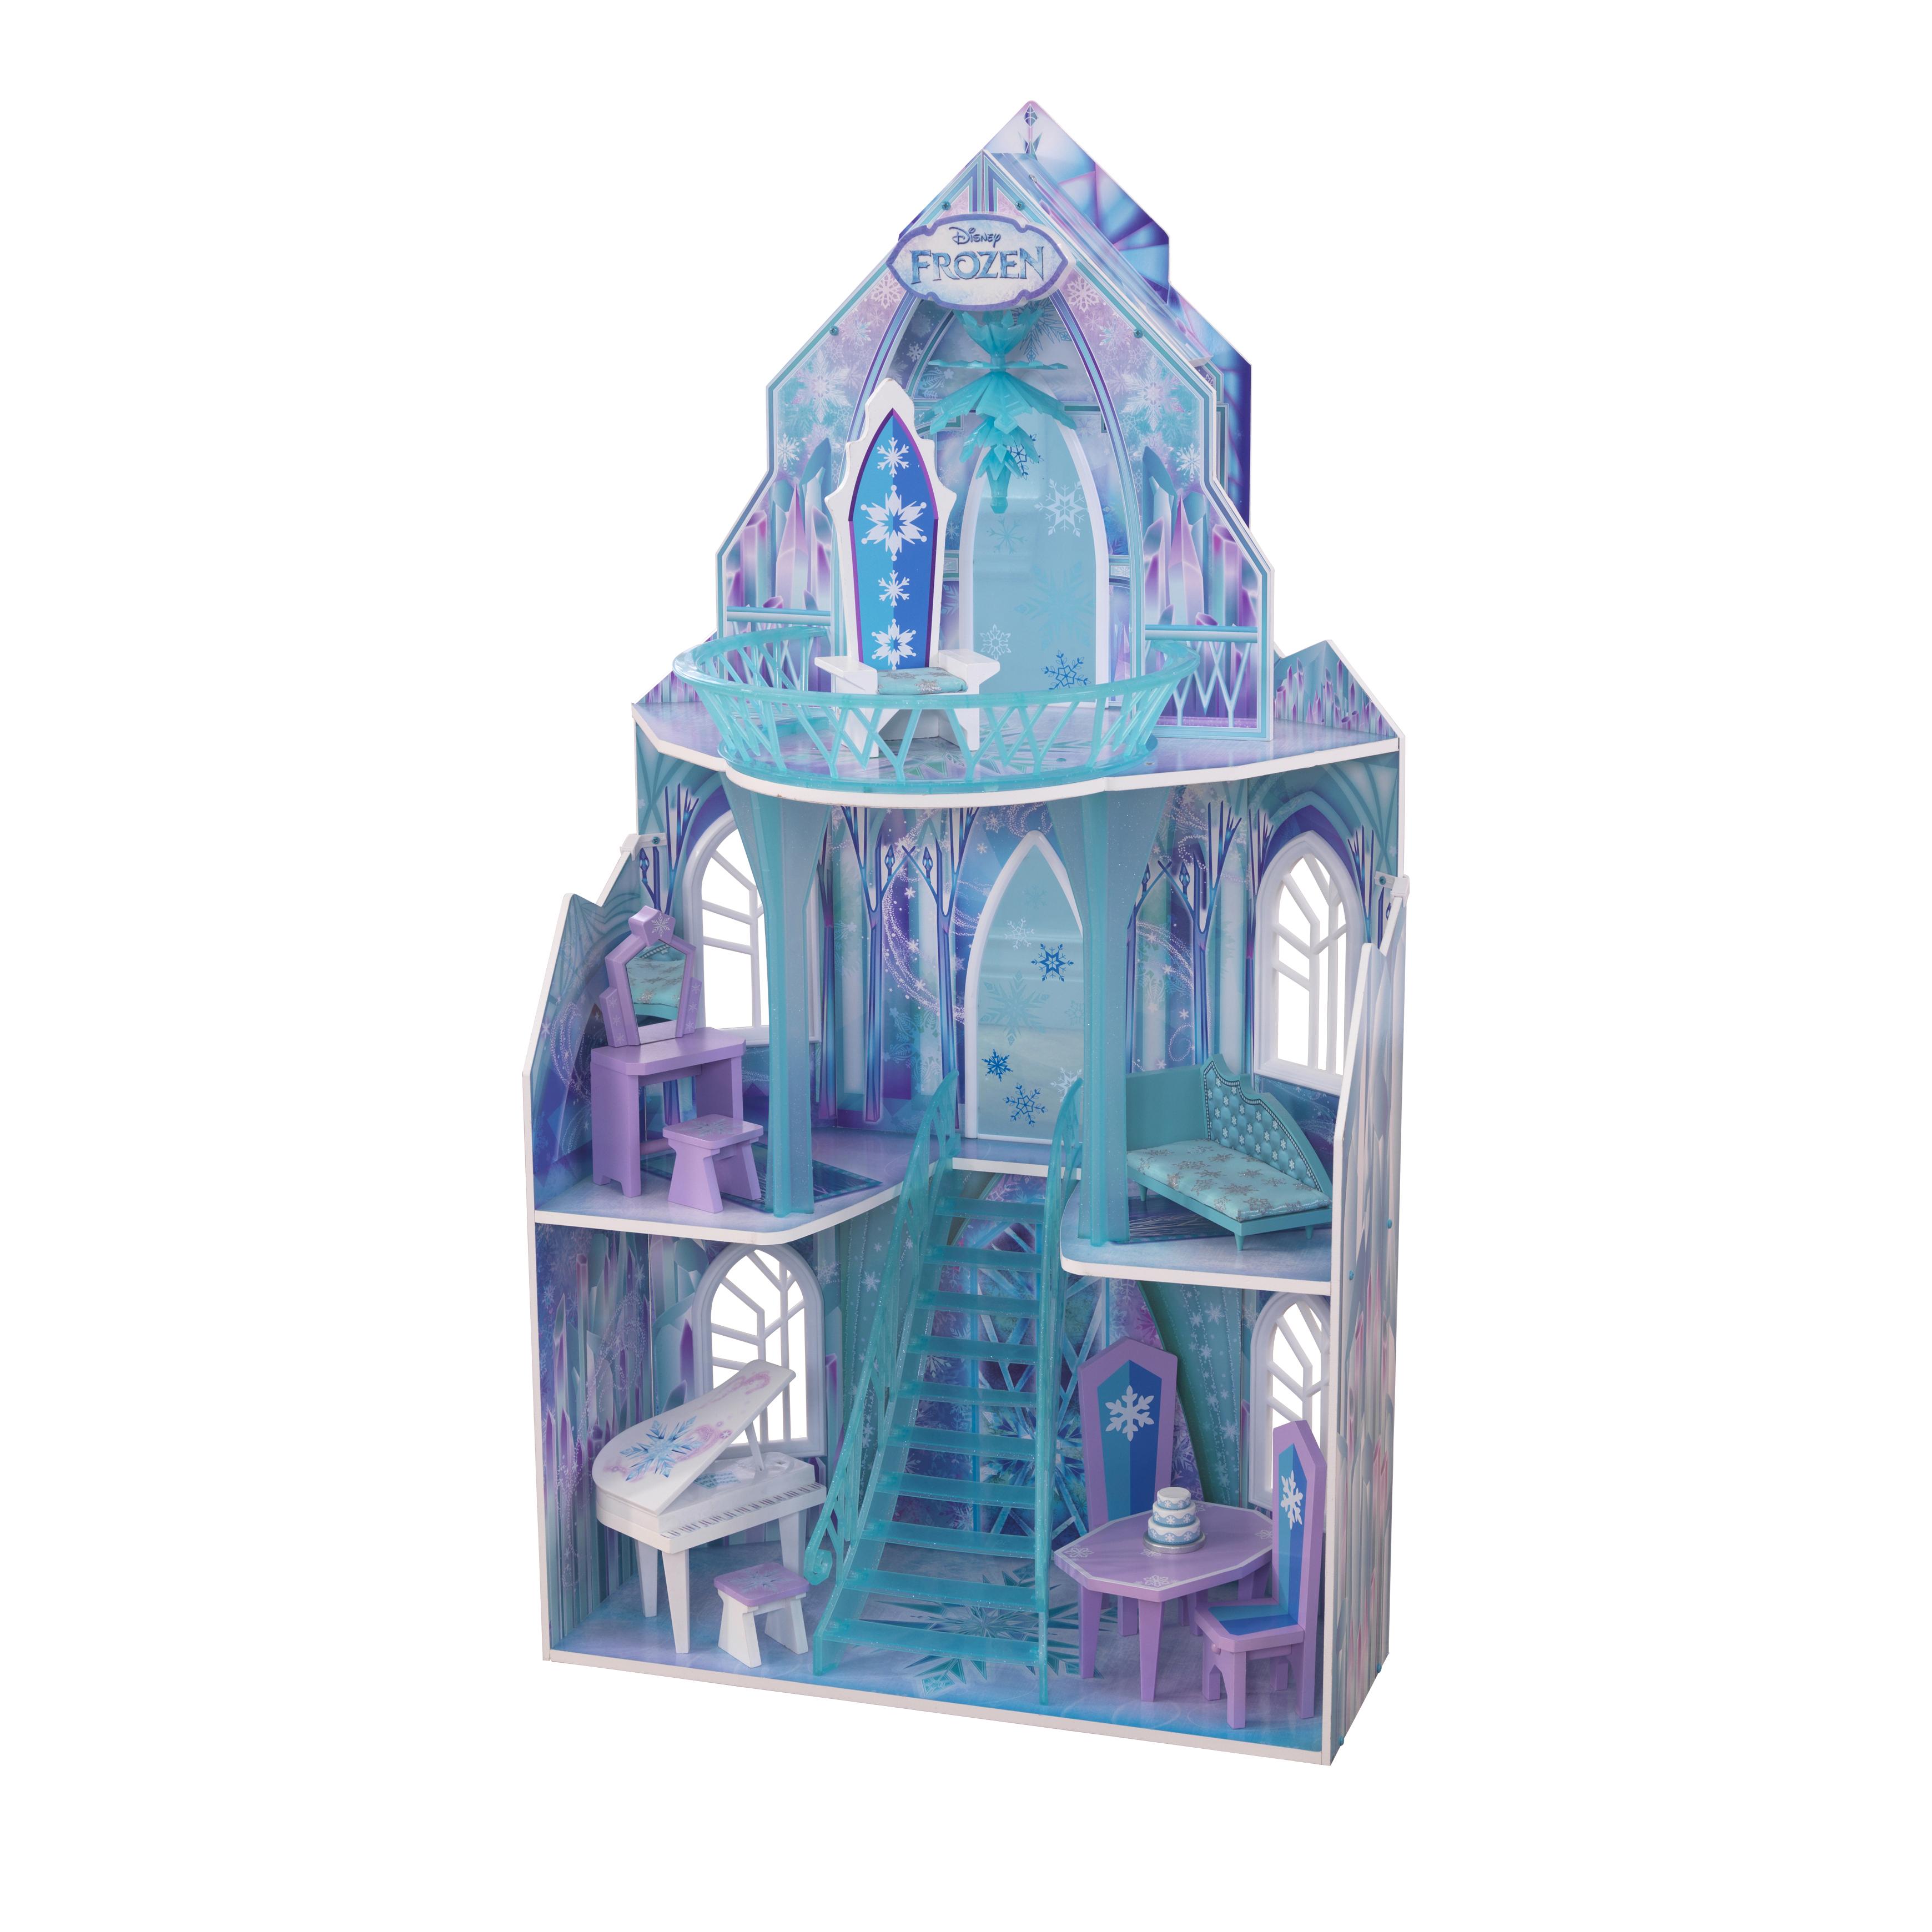 KidKraft Disney® Frozen Ice Castle Dollhouse with 11 Accessories